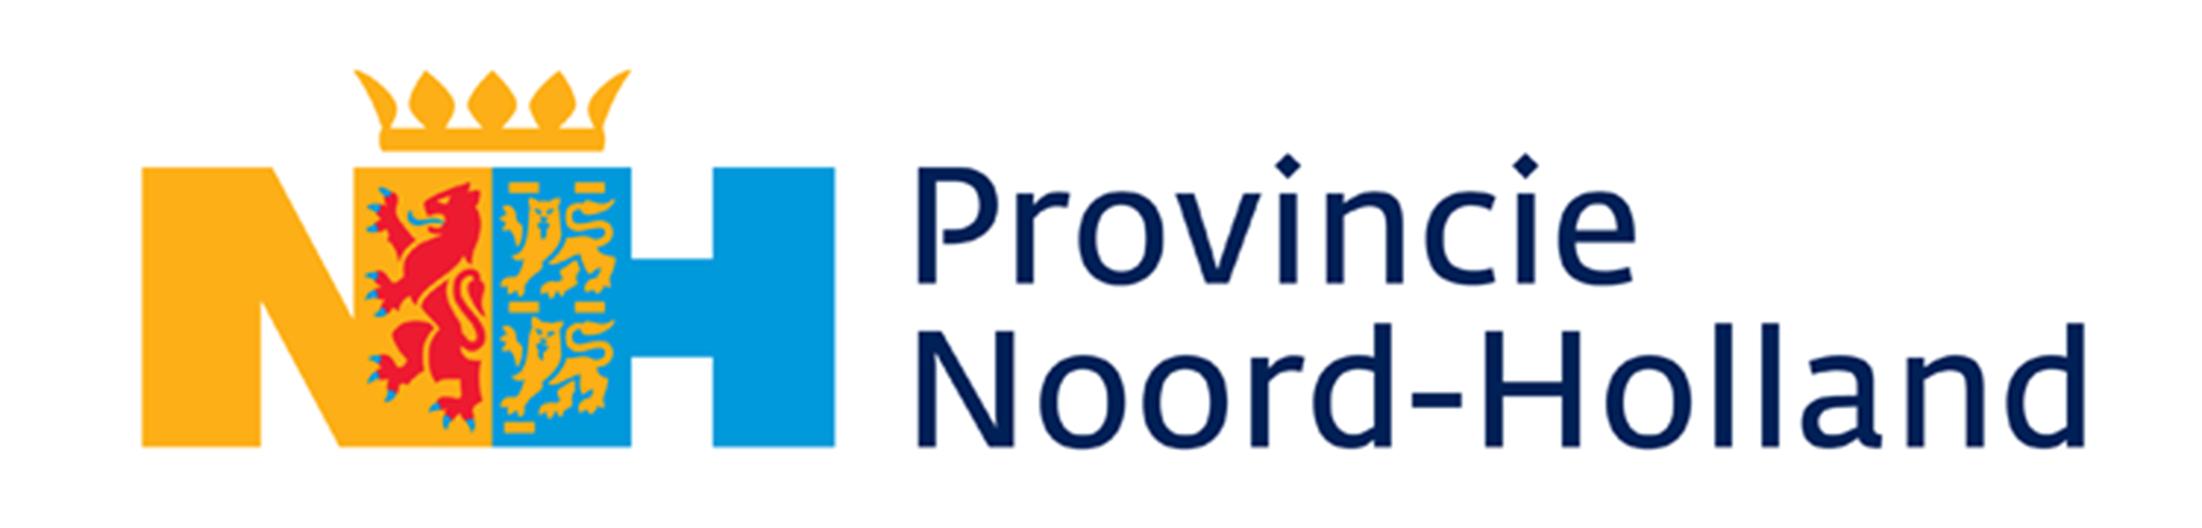 provincie_noord-holland